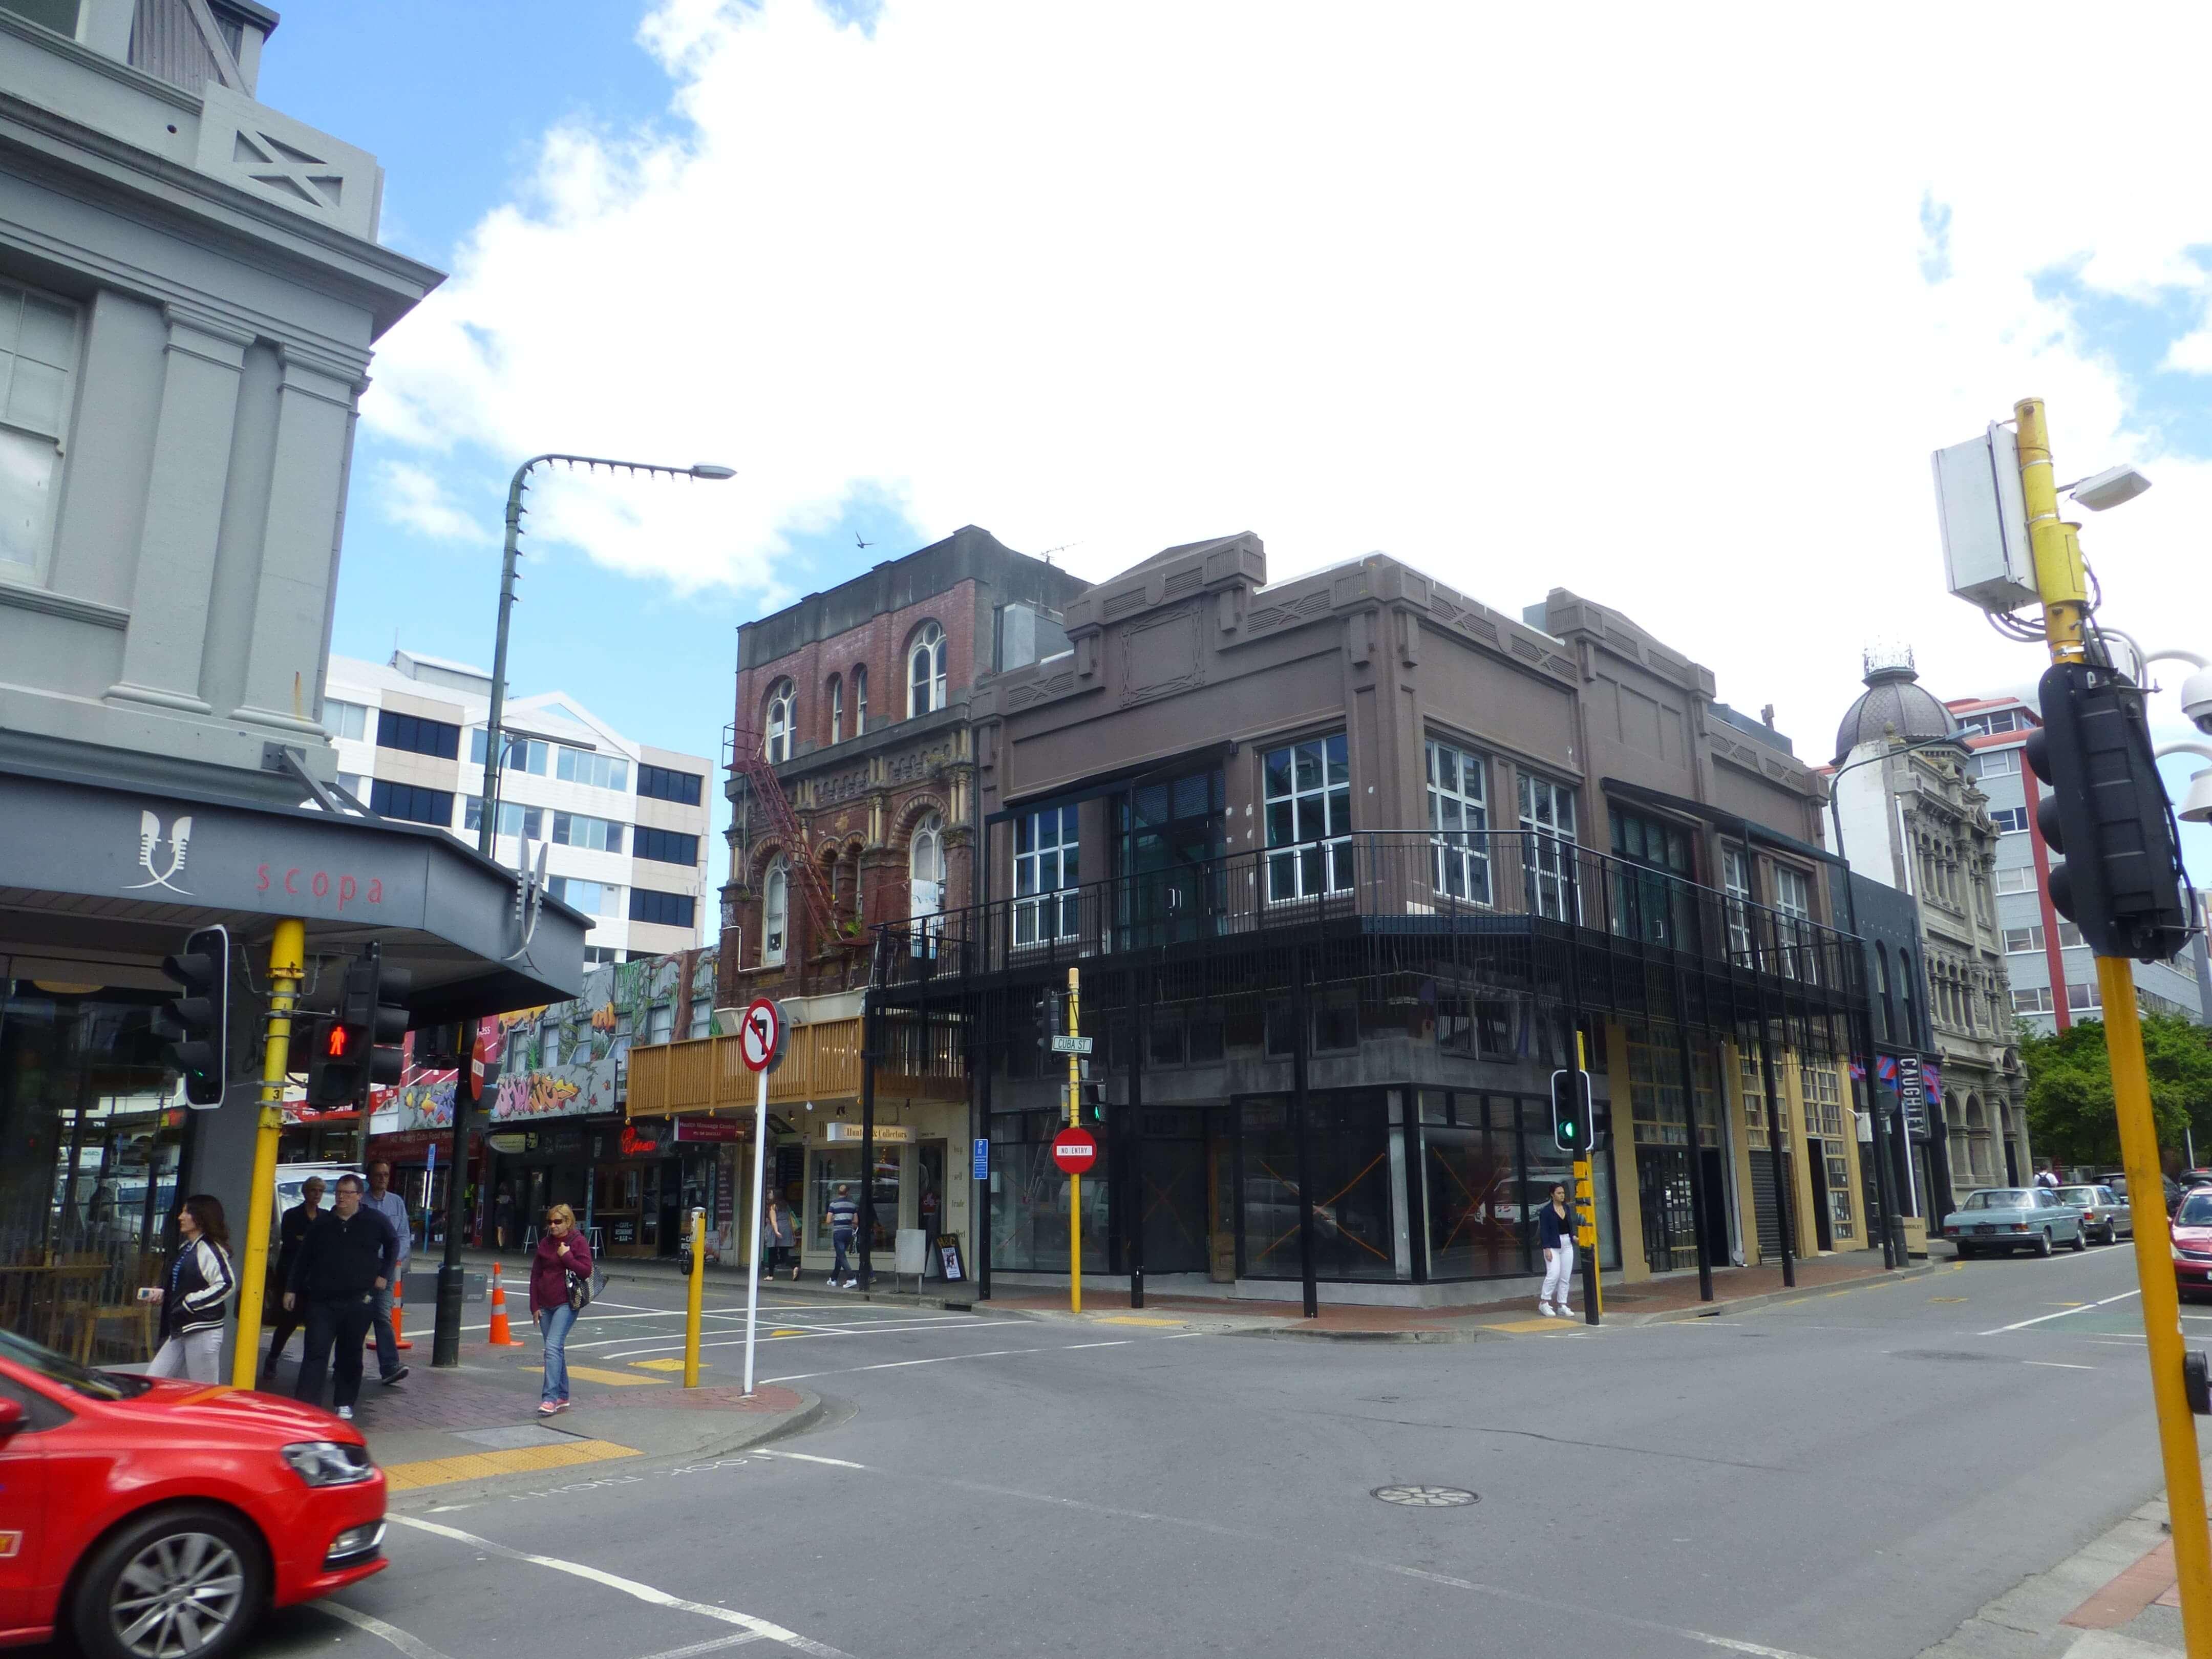 im Zentrum, Wellington, Neuseeland, Weit-weg.reisen 5